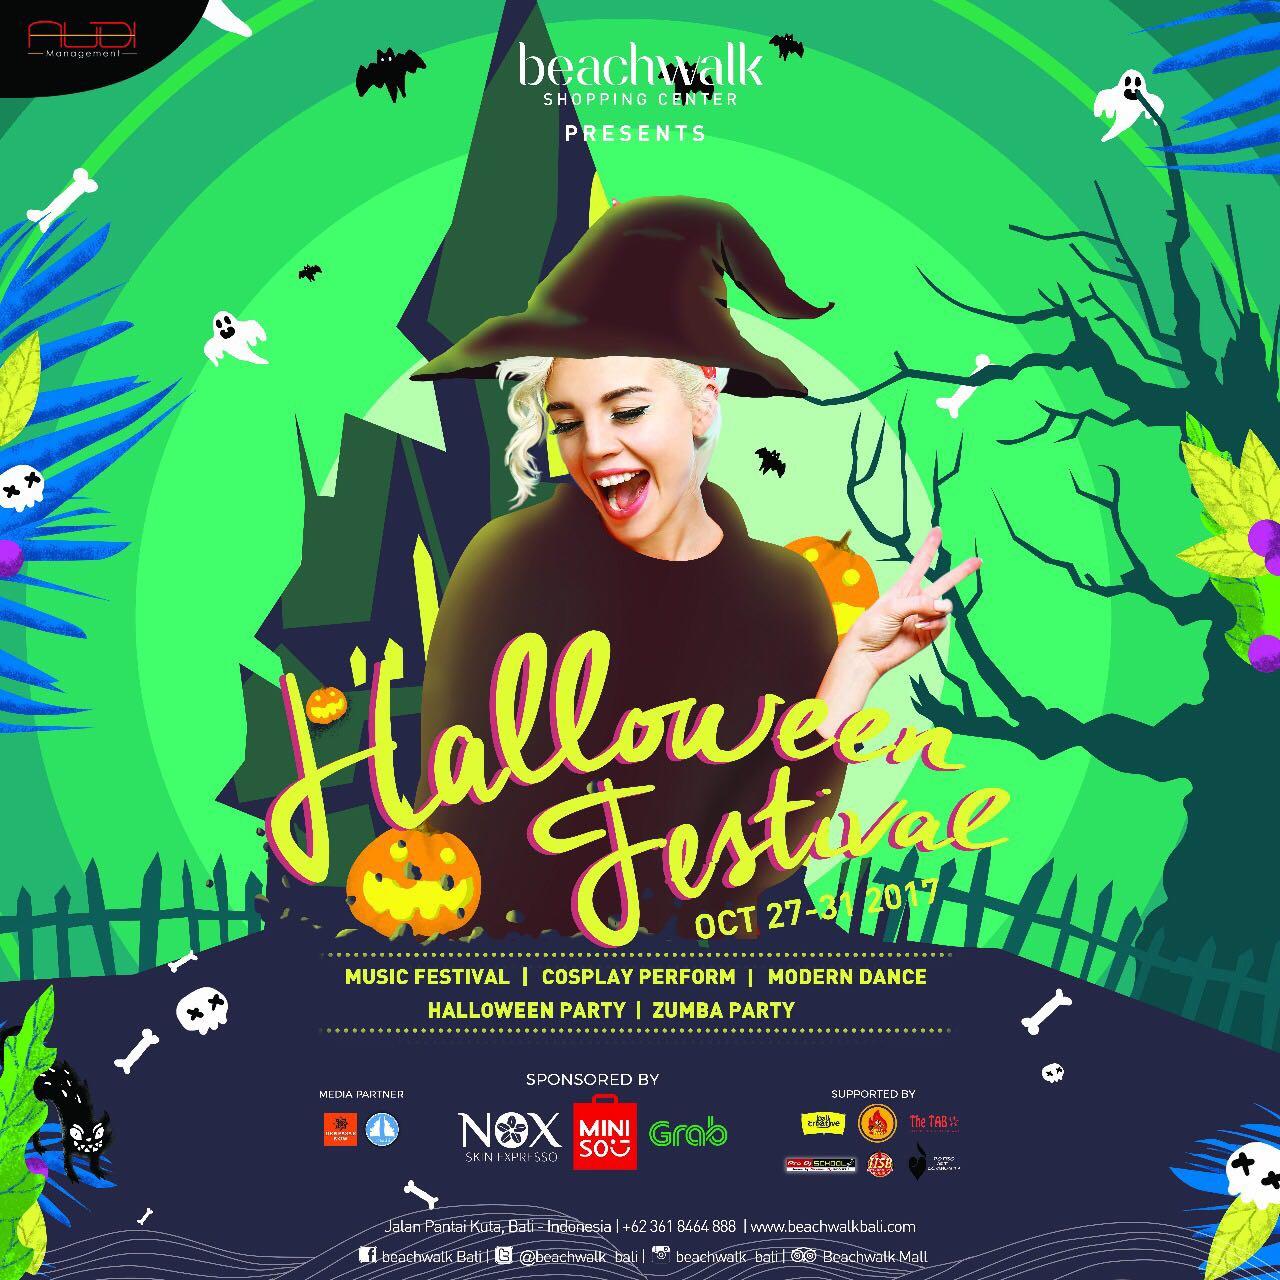 Grab Bali – Beachwalk Halloween Festival